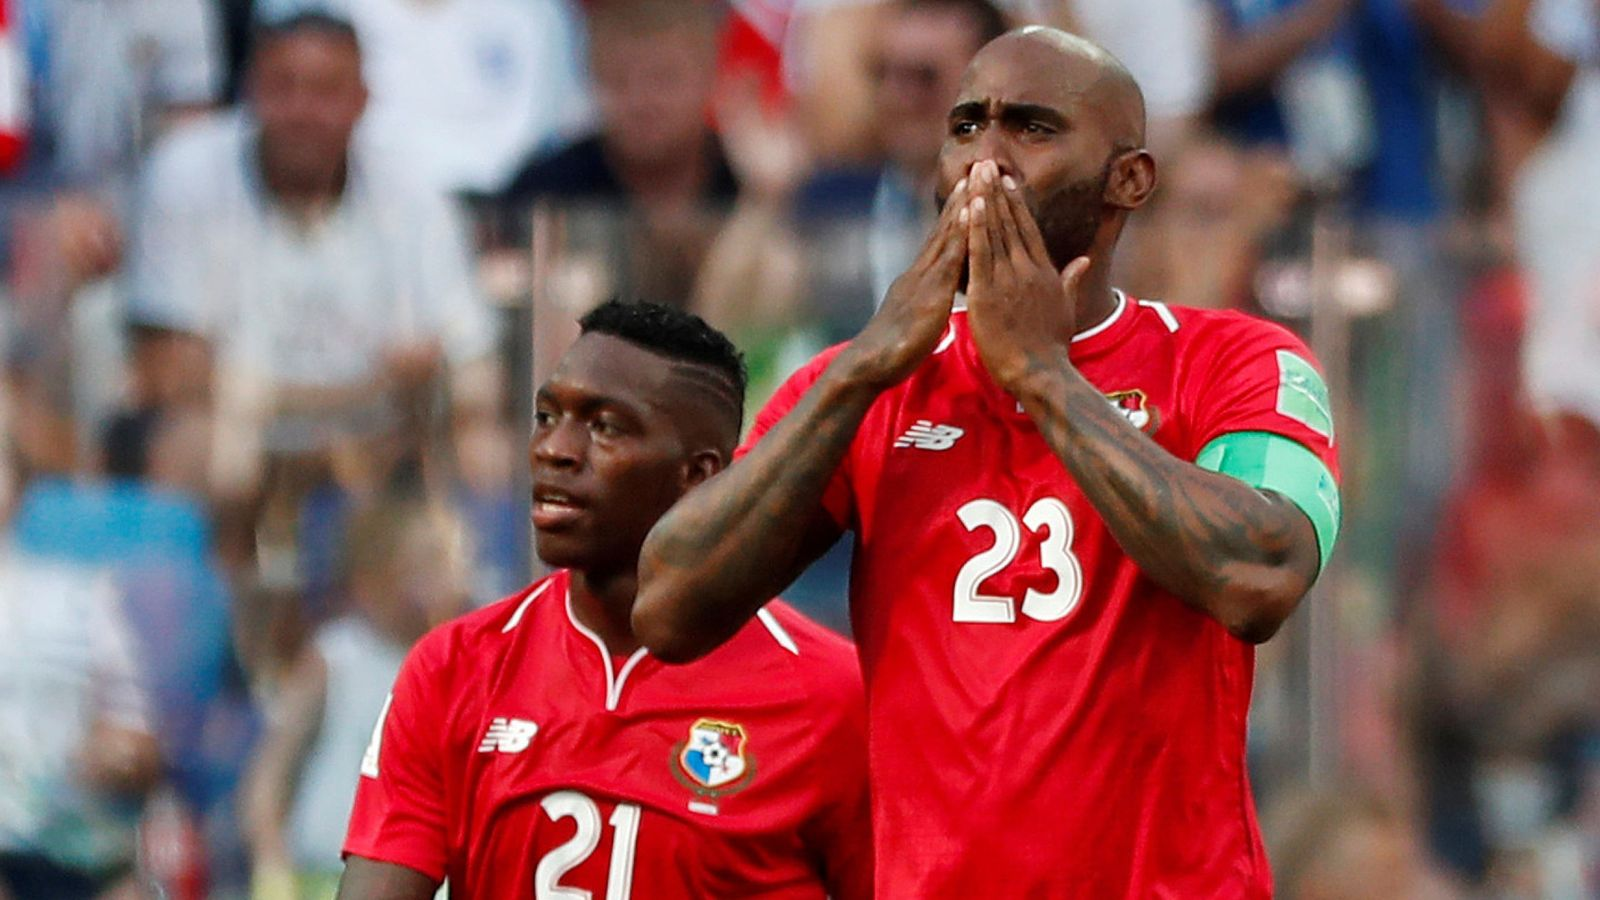 Foto: File photo: world cup - group g - england vs panama